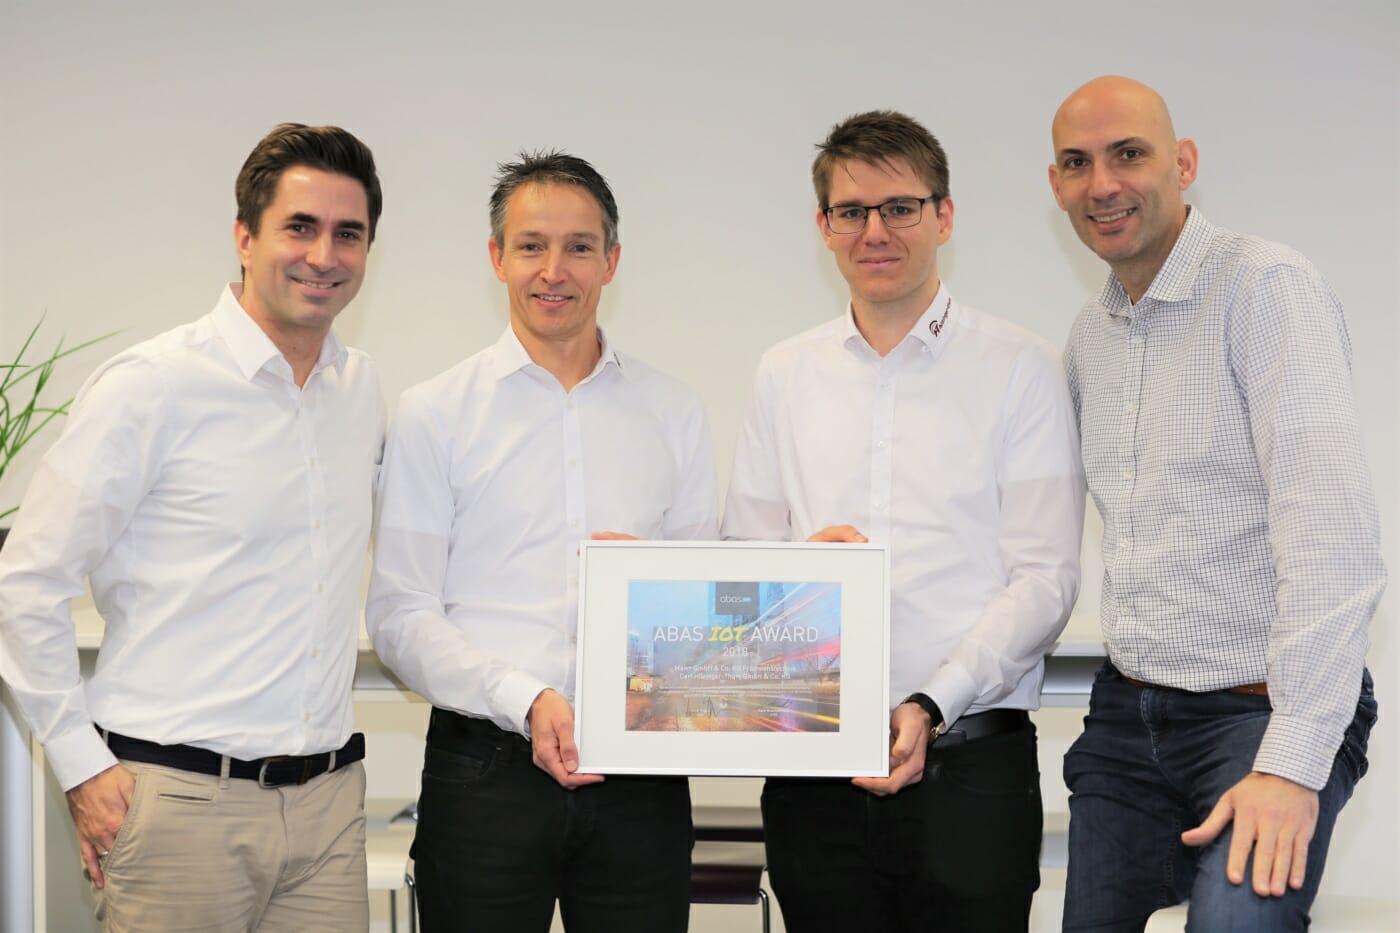 abas_iot-award